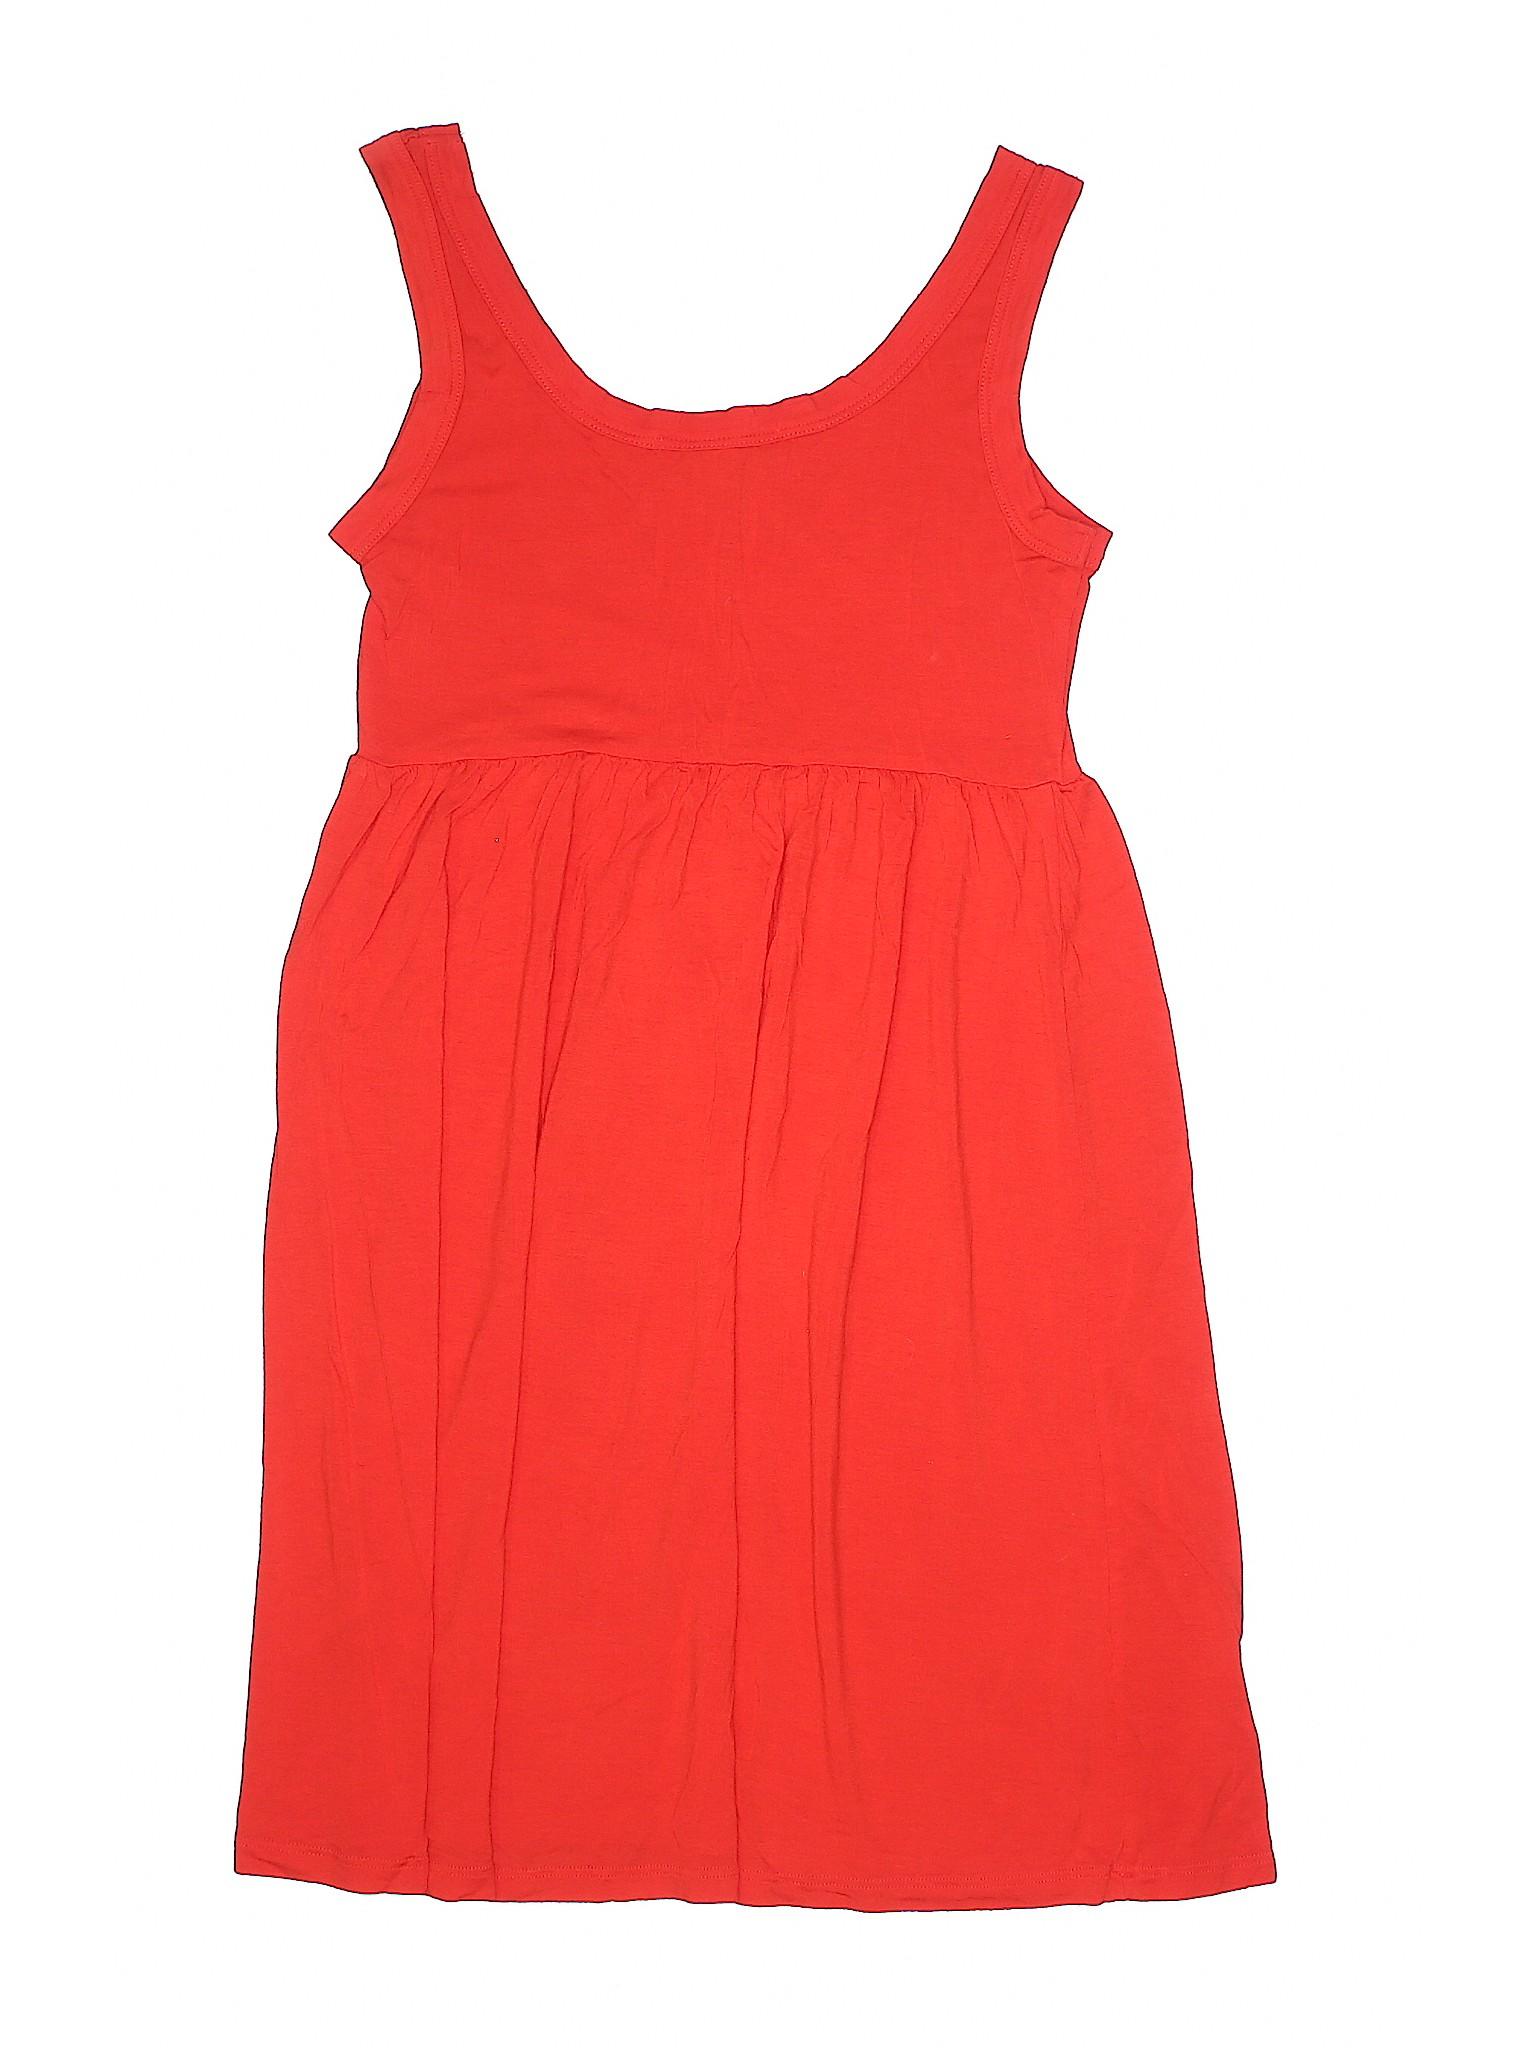 Dress Twenty winter Boutique One Casual xnqPCIC5wR